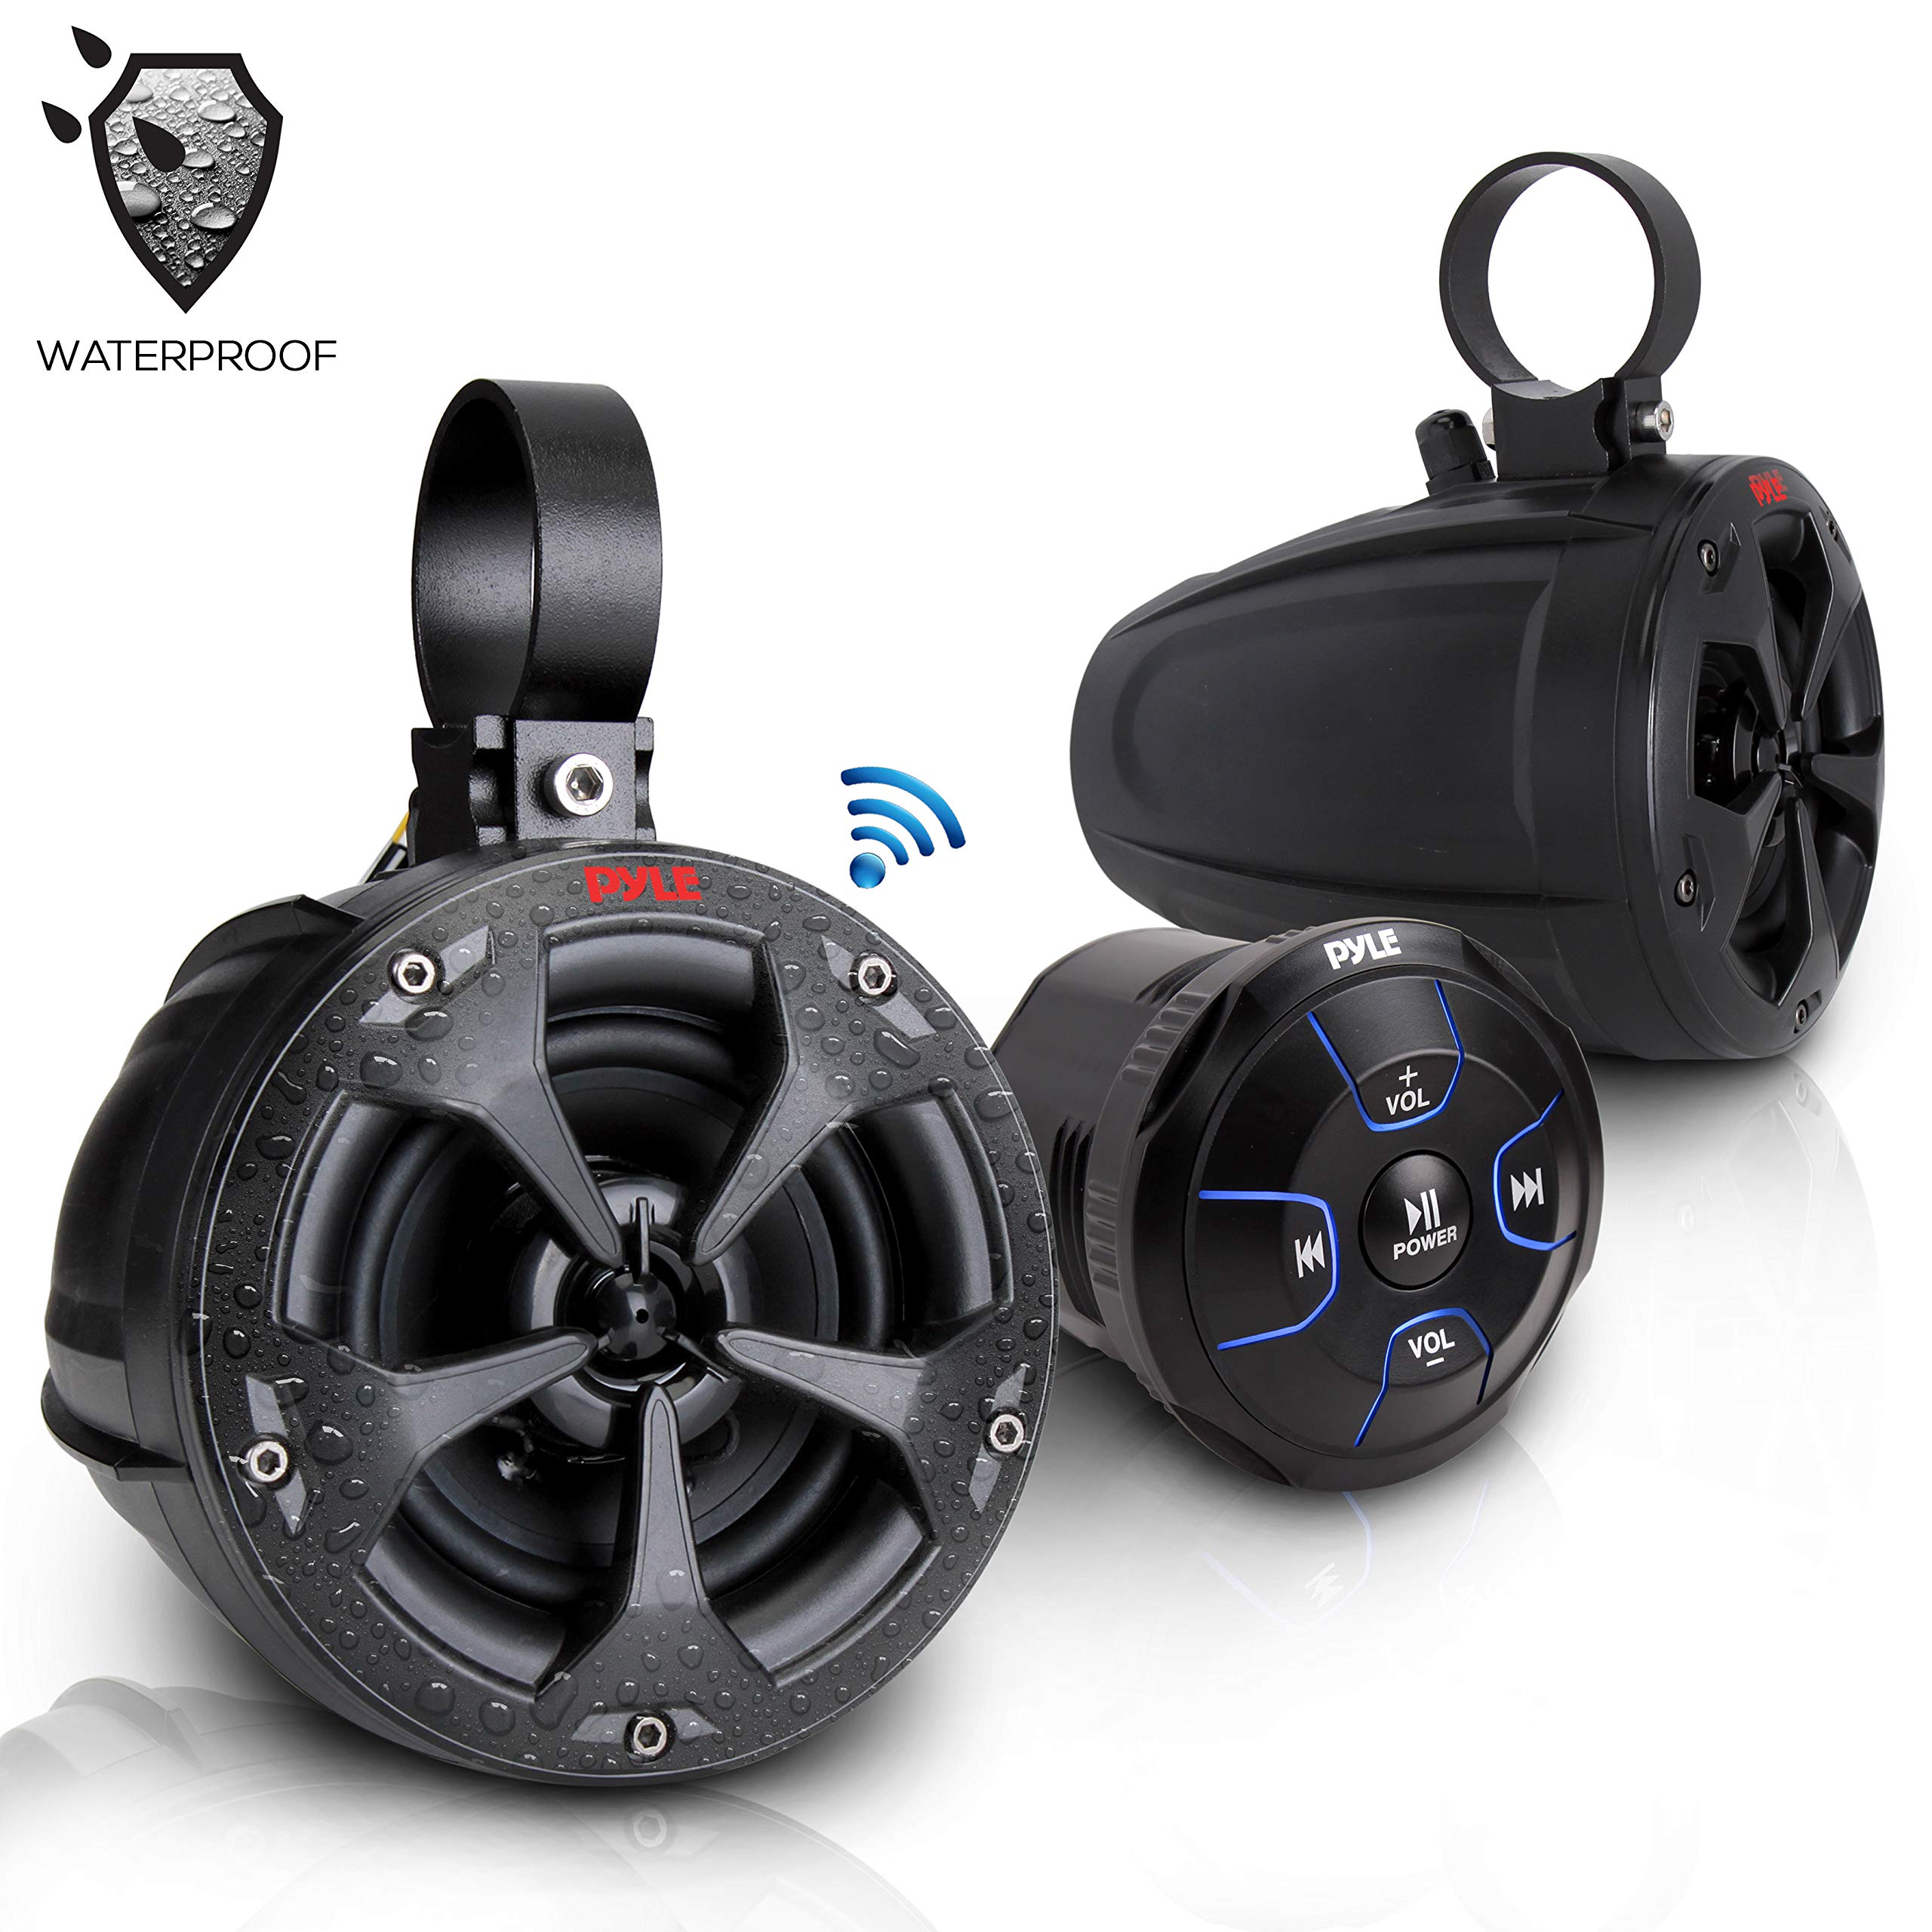 2-Way Dual Bluetooth Off-Road Speakers - 4 Inch 800W Marine Grade Waterproof Wakeboard Tower Speakers System, Full Range Outdoor Audio Stereo Speaker for ATV, UTV, Quad, Jeep, Boat - Pyle PLUTV46BTA by Pyle